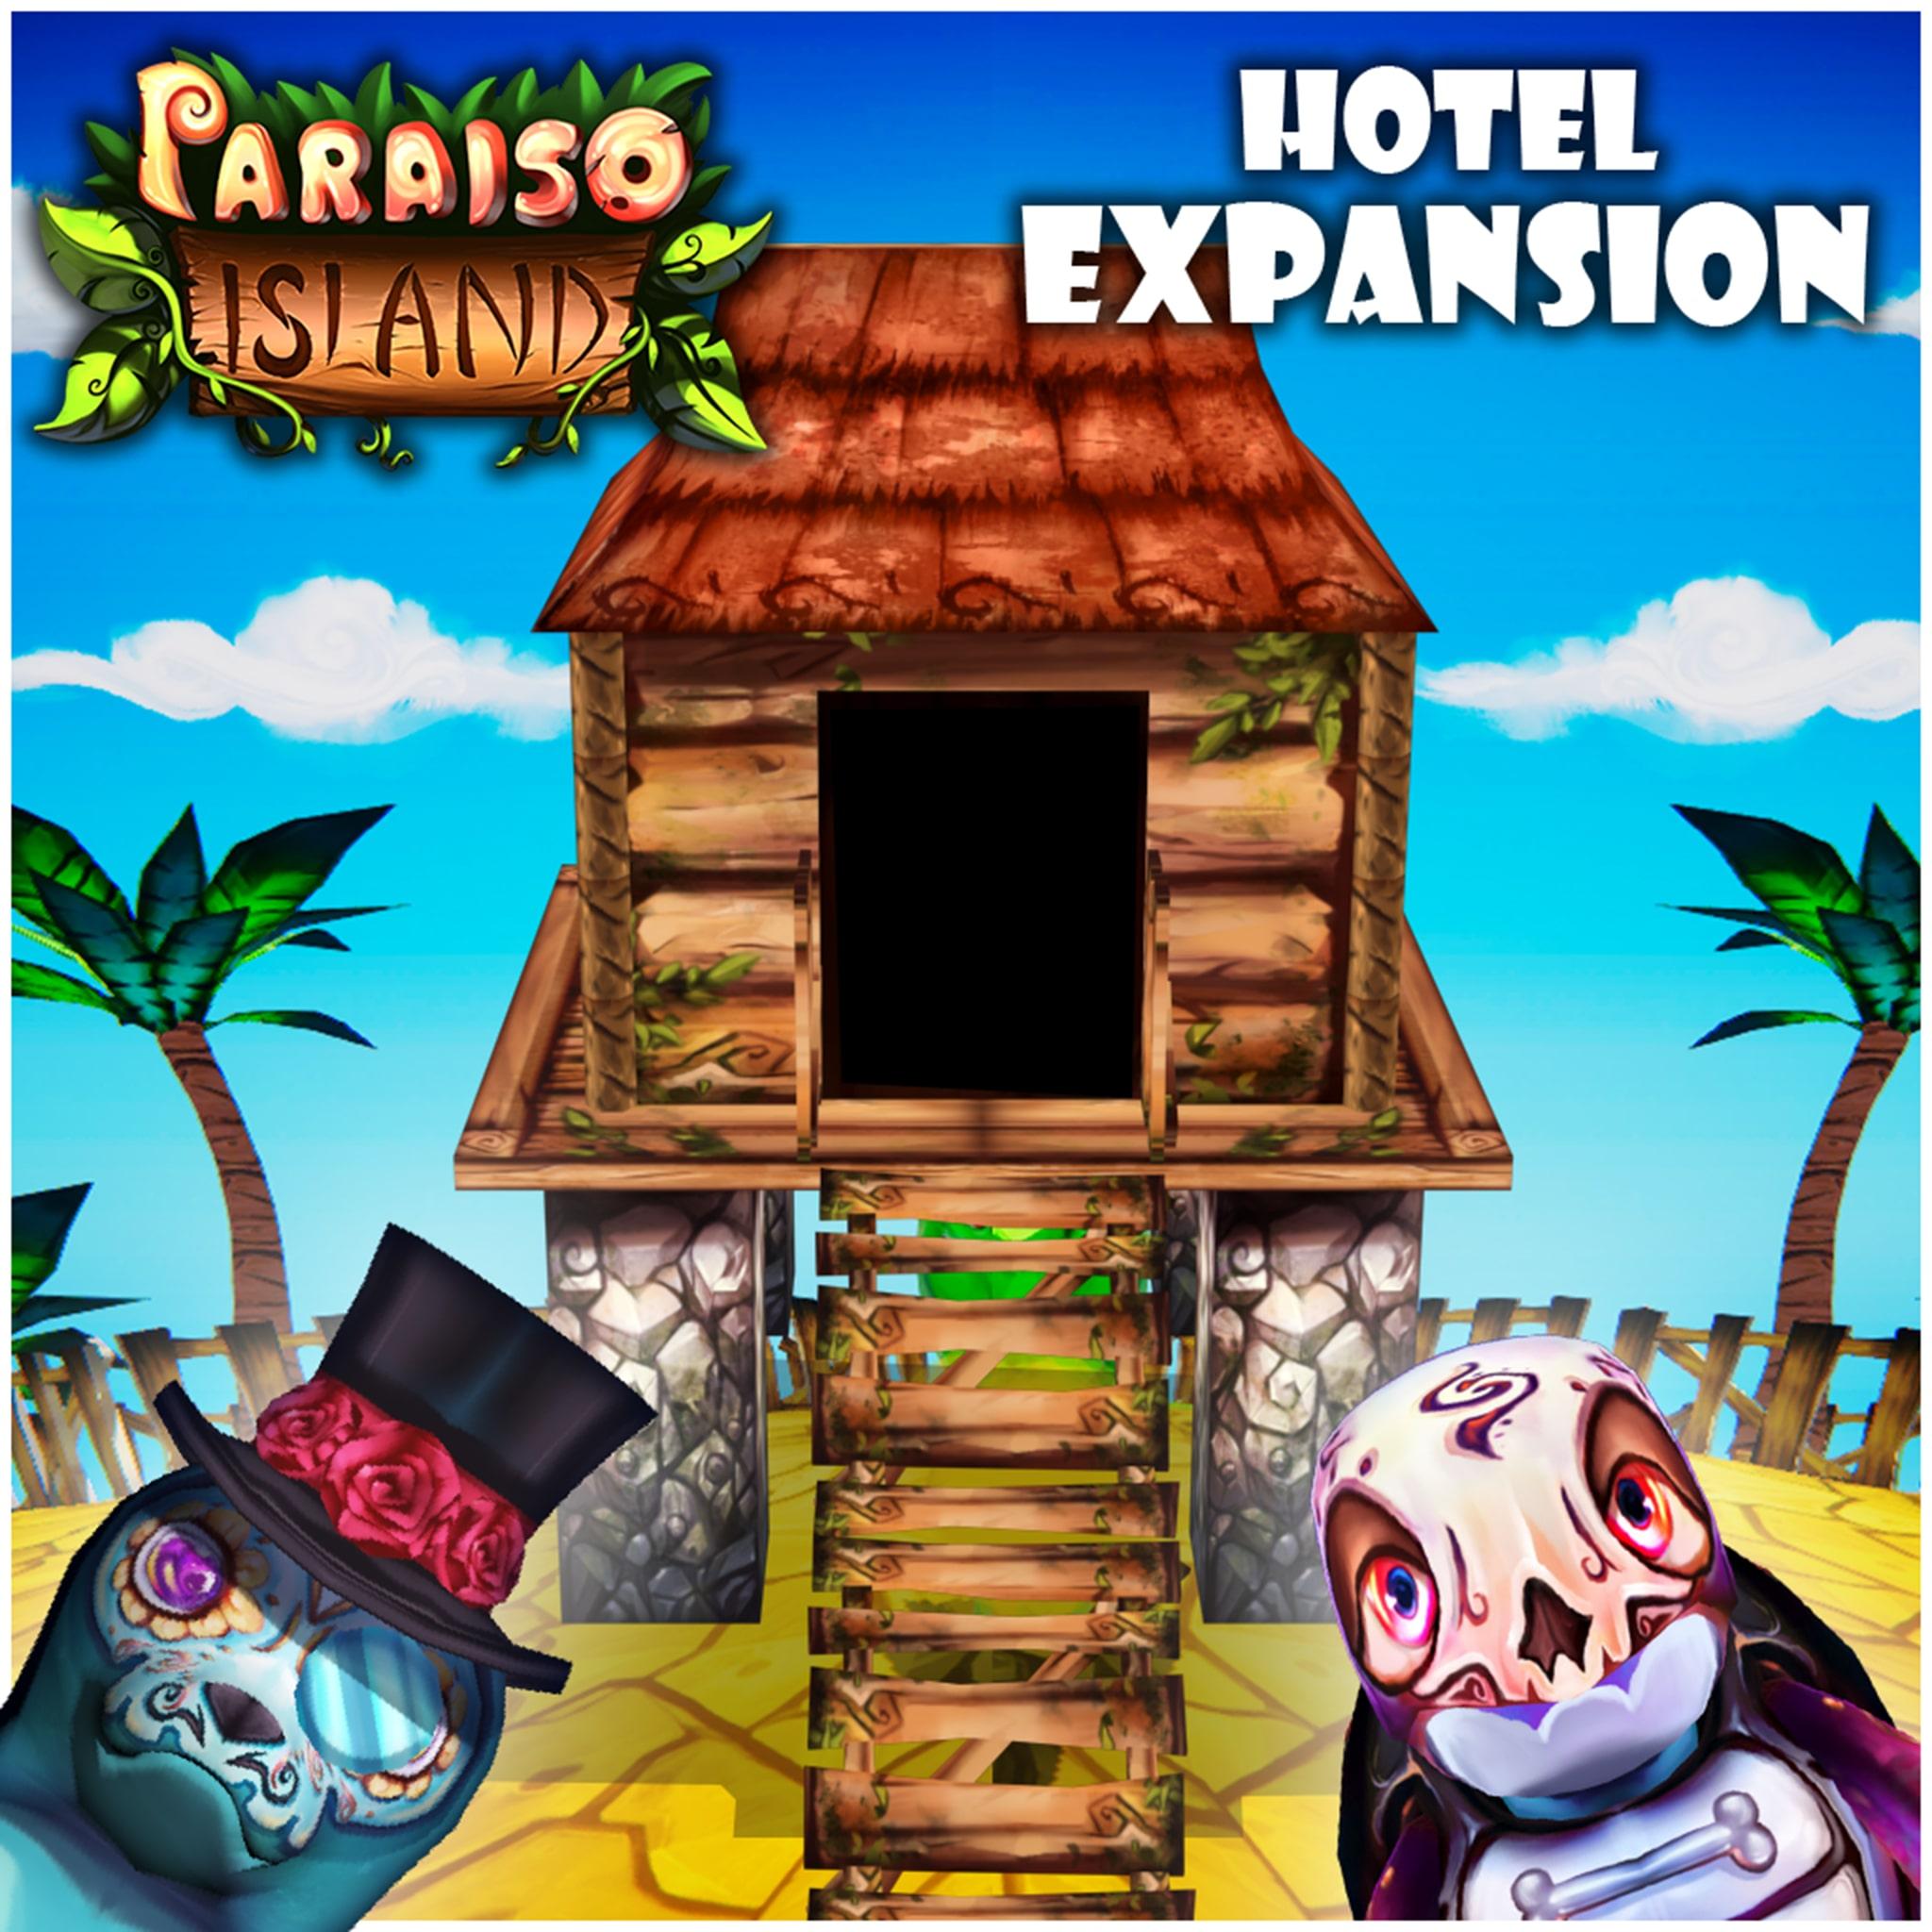 Paraiso Island Hotel Expansion